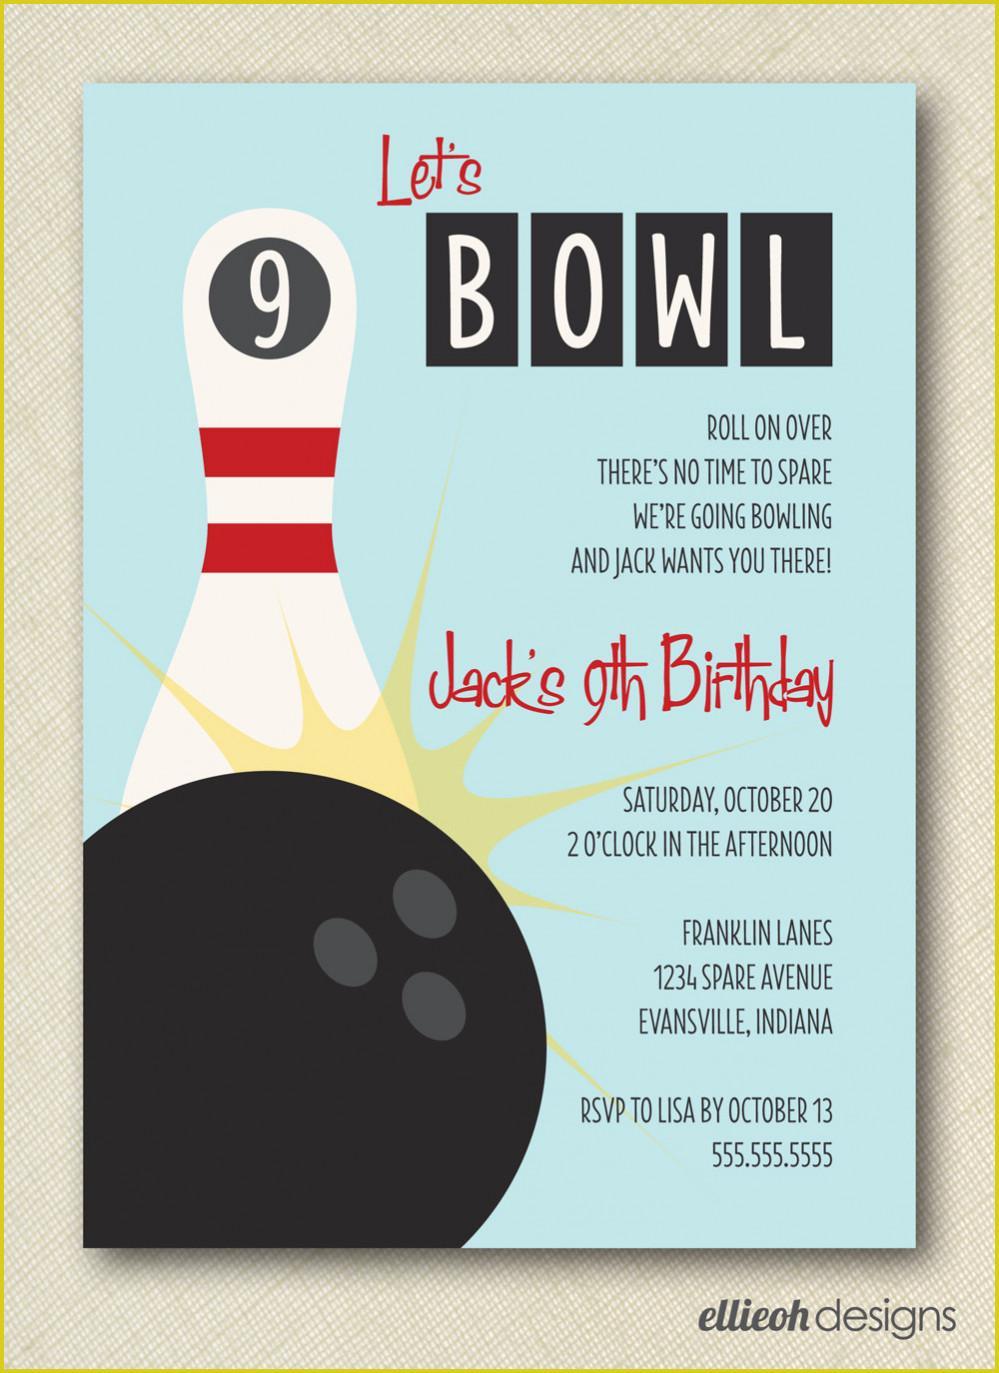 Bowling Birthday Invitation Templates Free